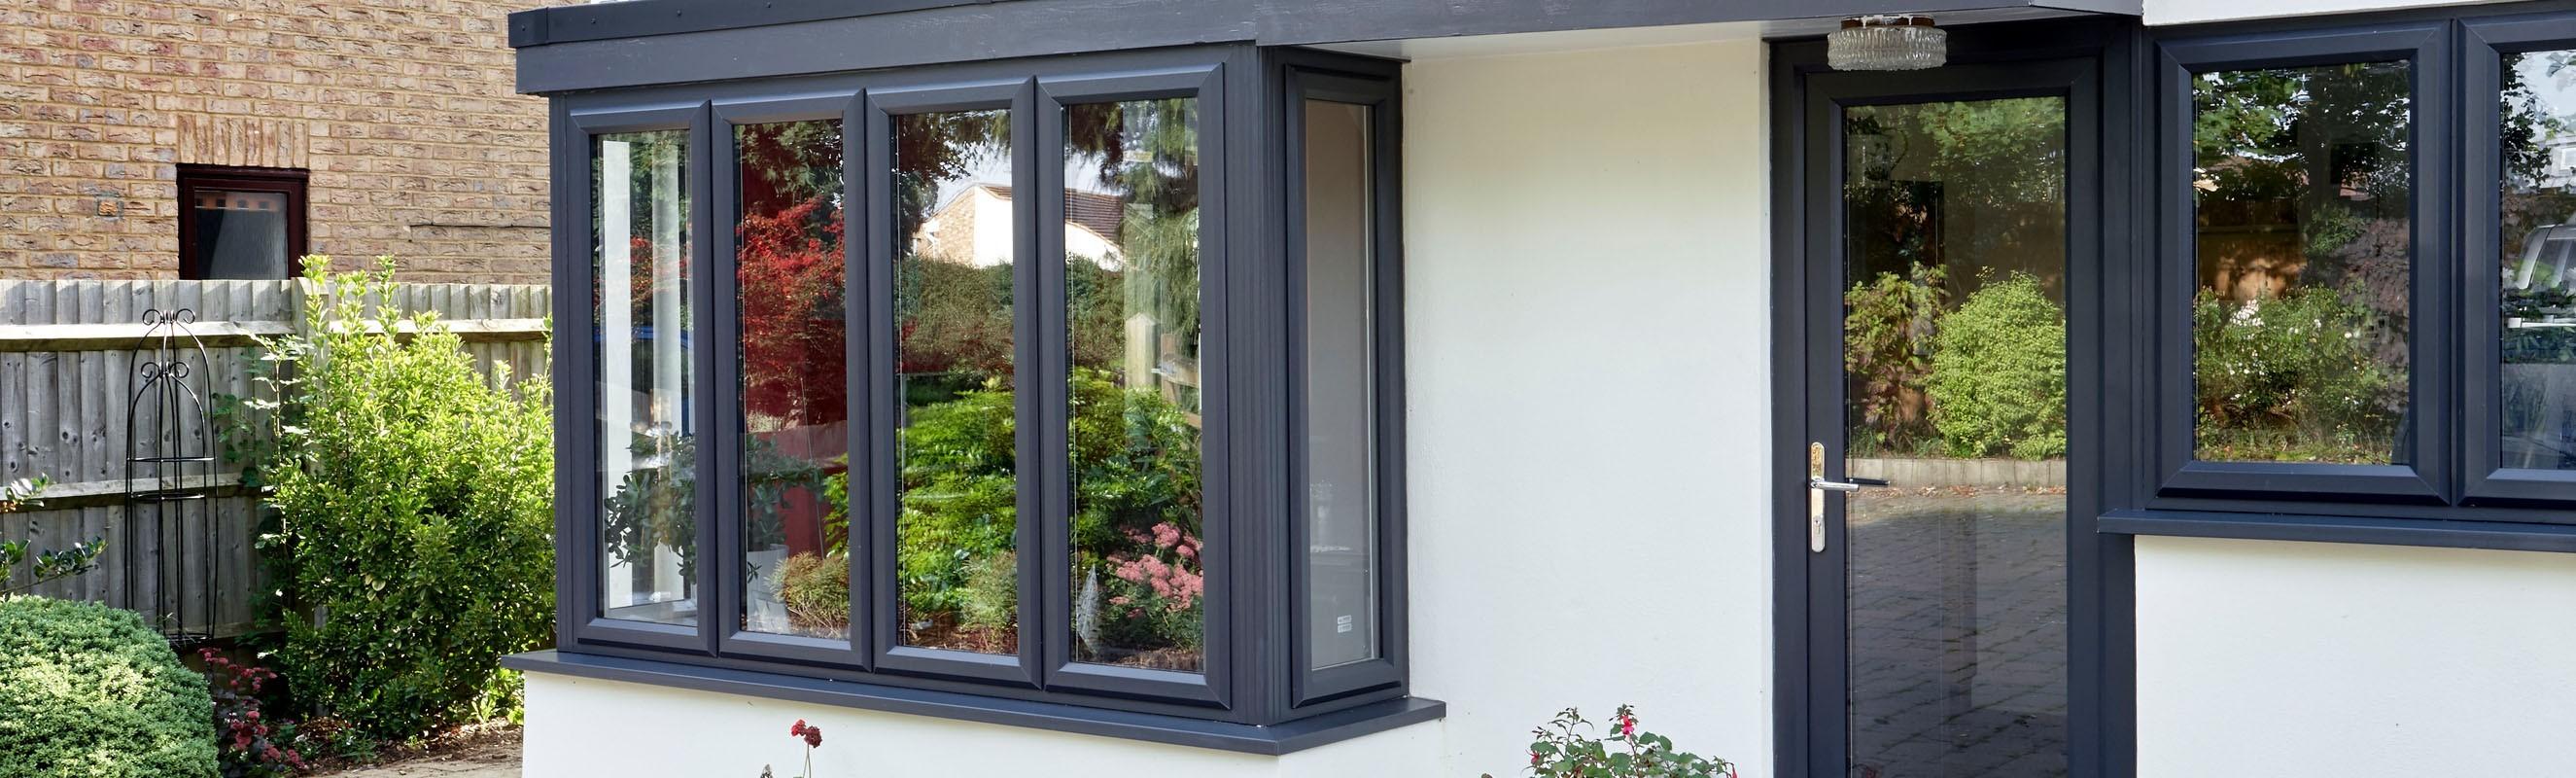 Double Glazed UPVC Windows   UPVC Doors   Bi fold Doors - Albro Windows